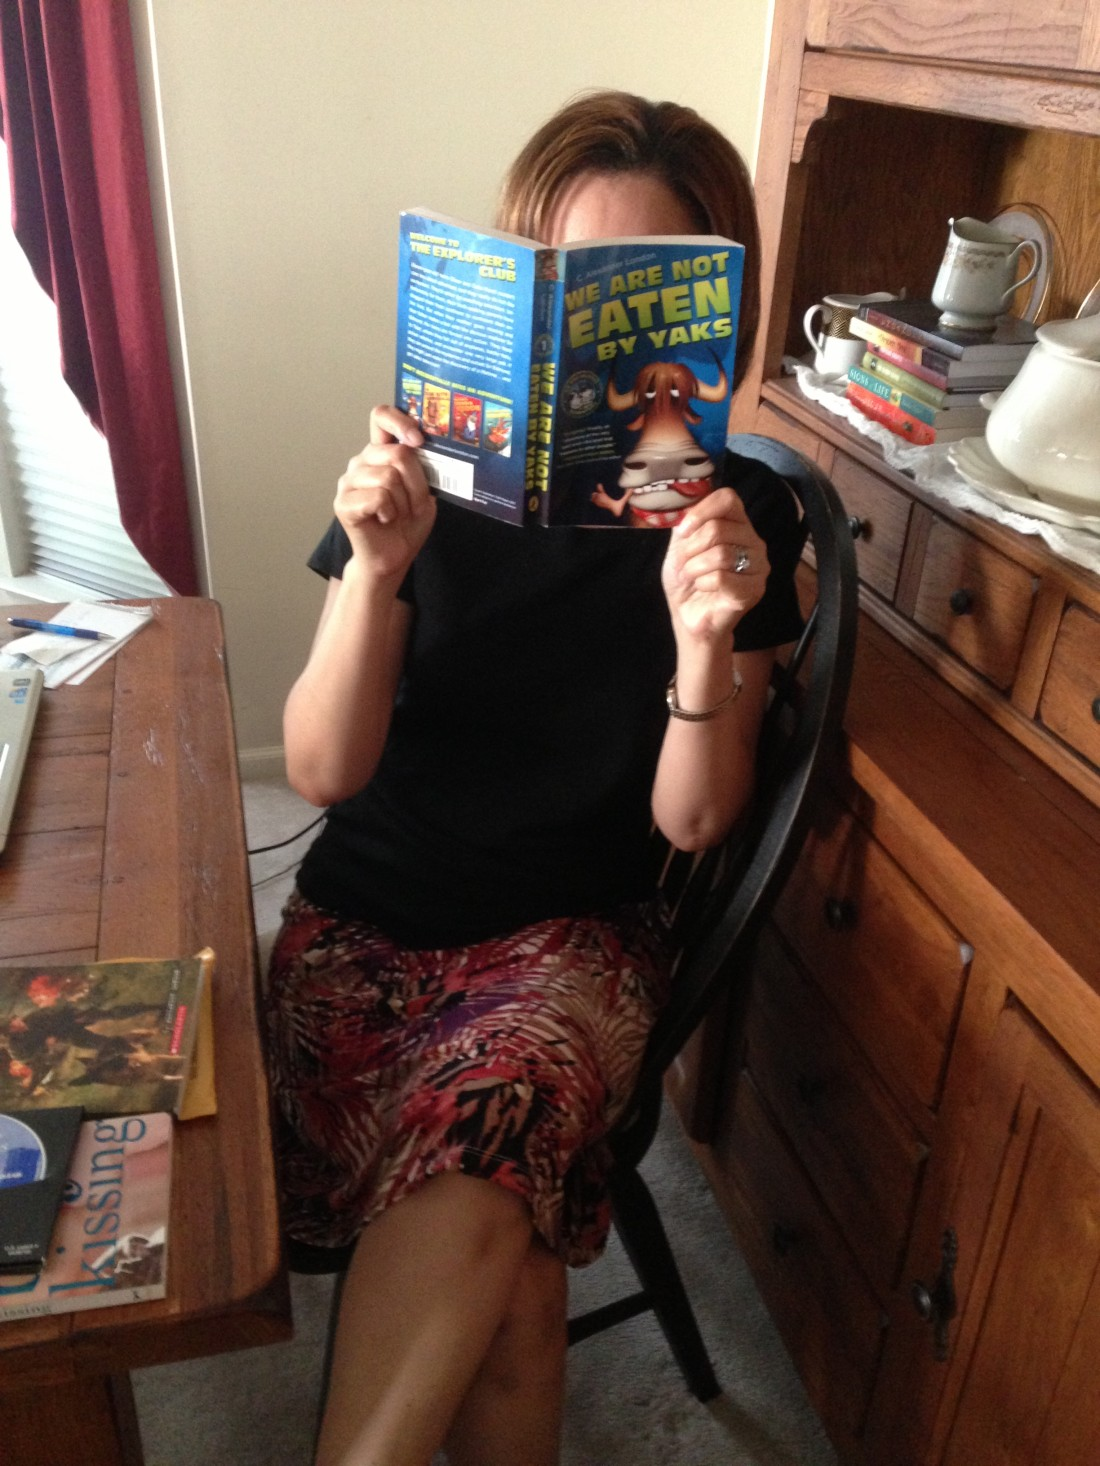 Tween Book Club We Are Not Eaten by Yaks by C Alexander London